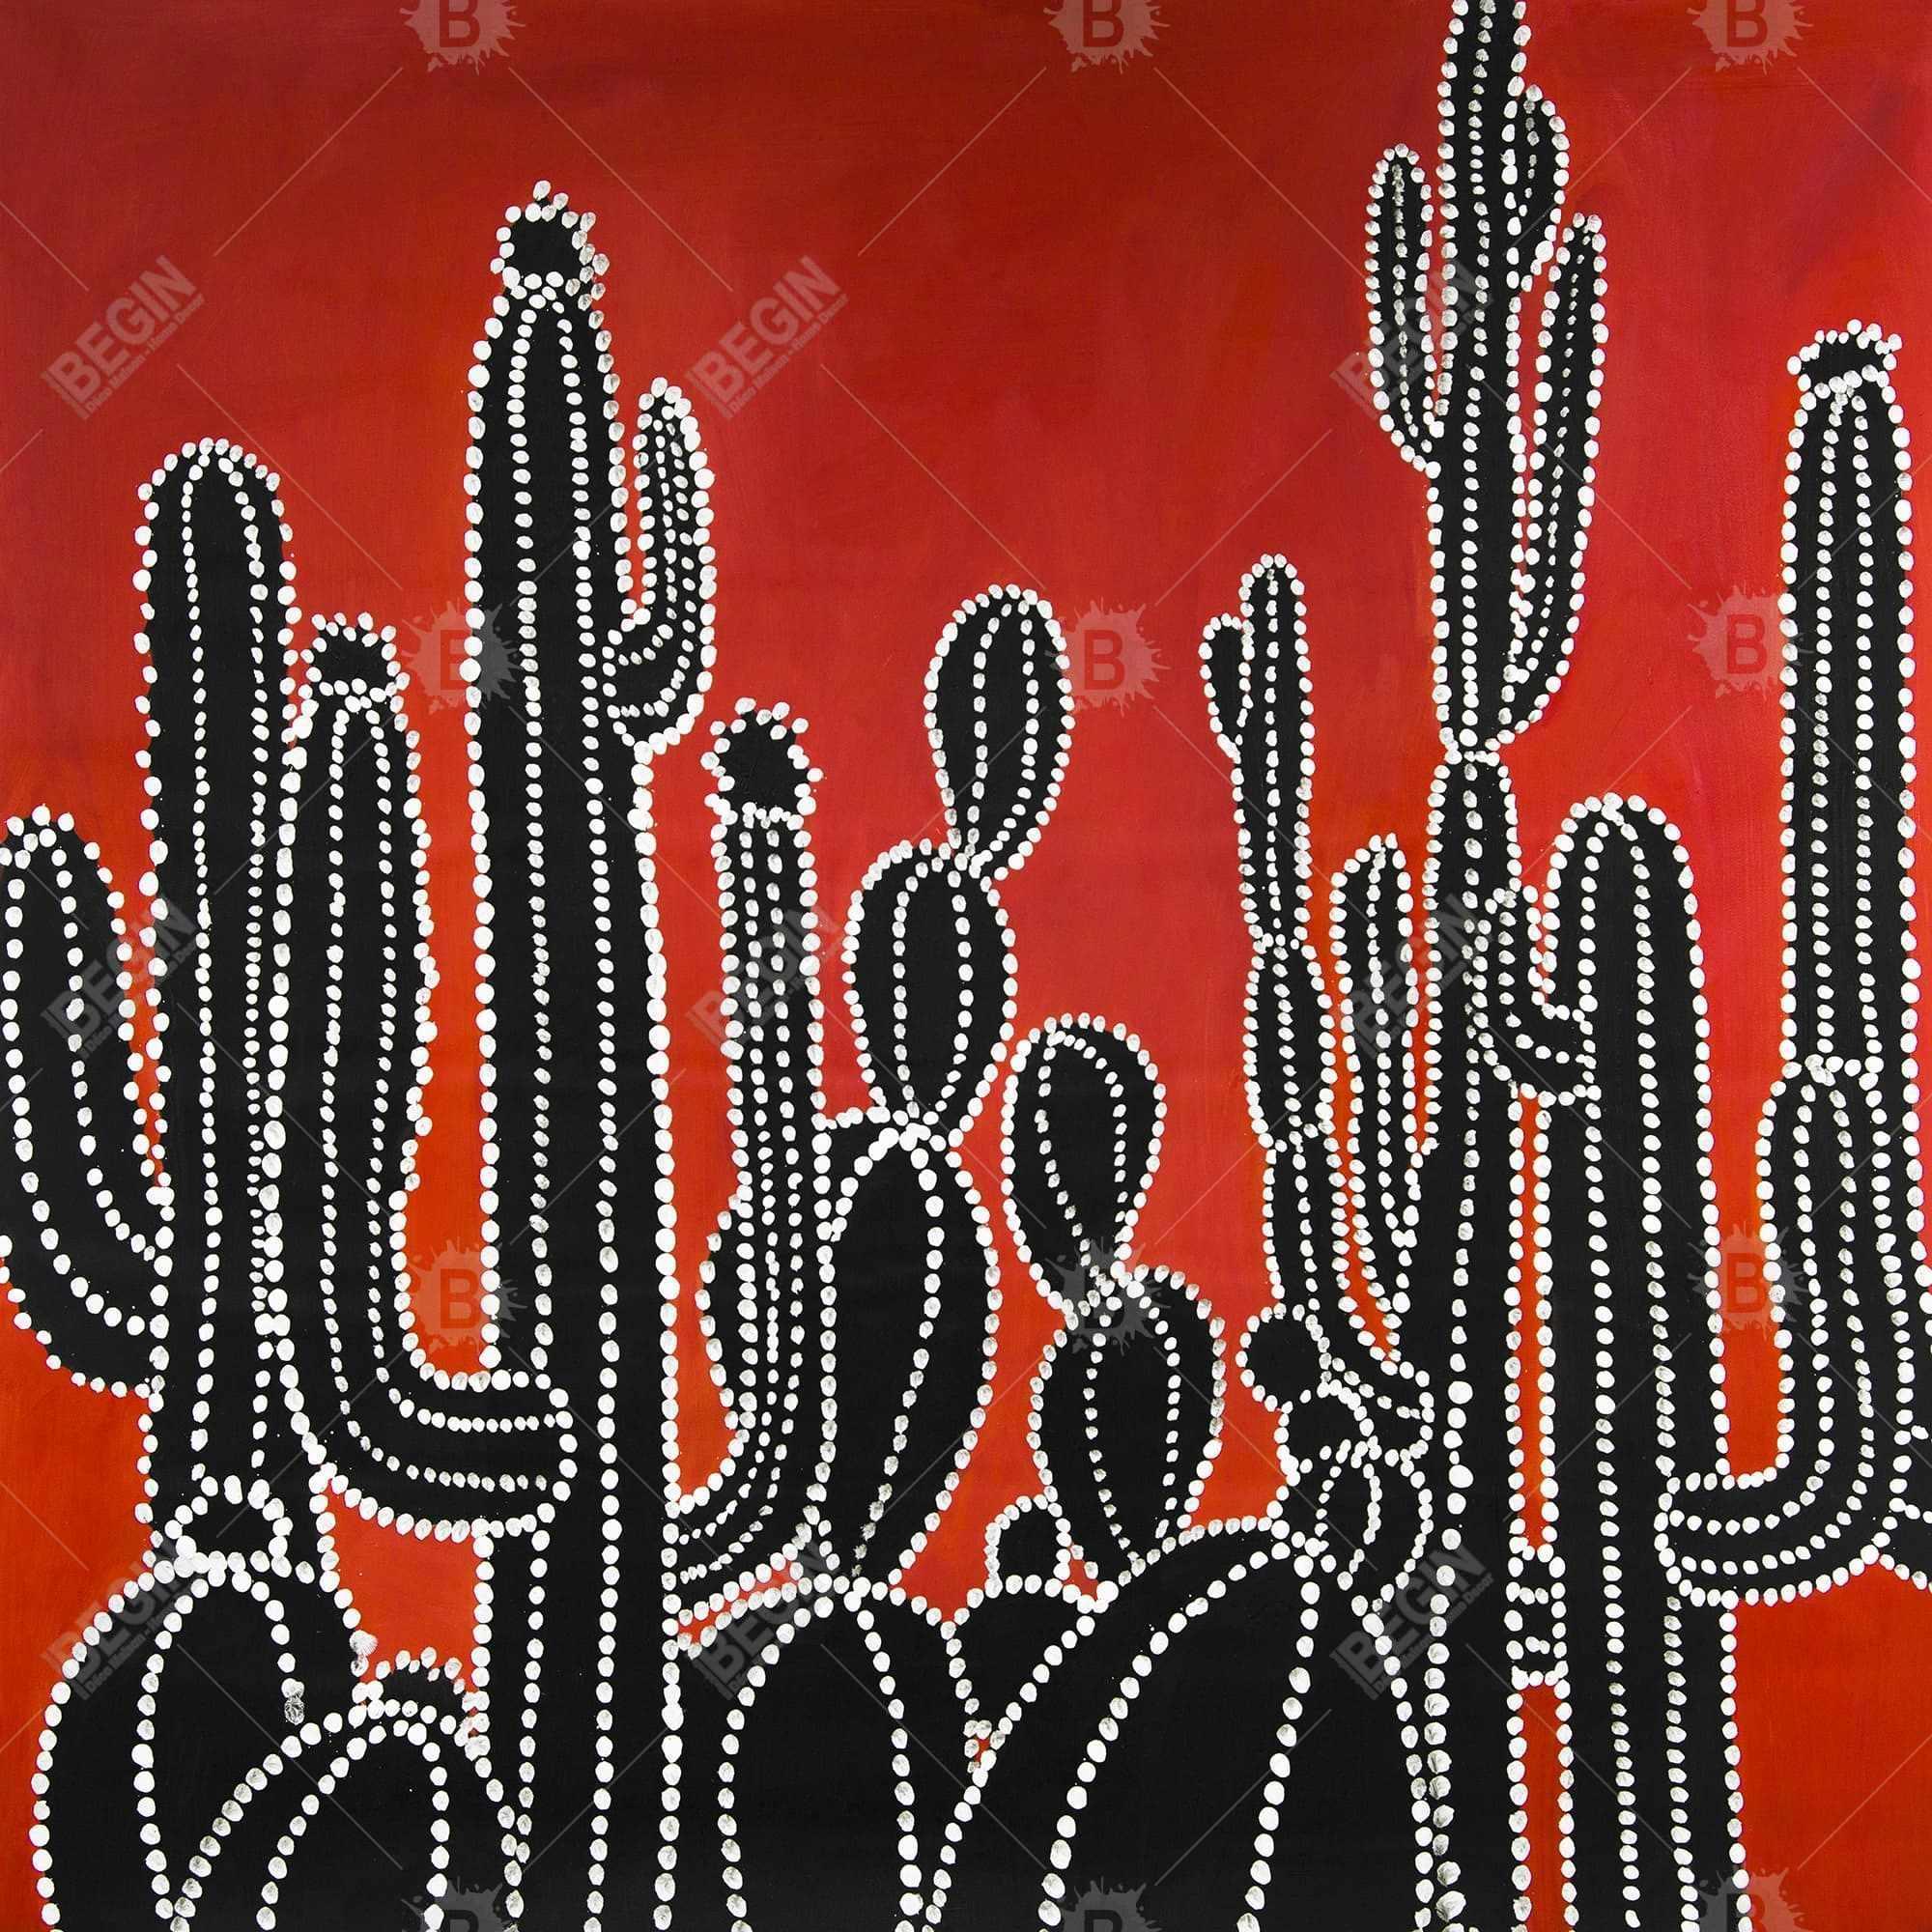 Black tall cactus